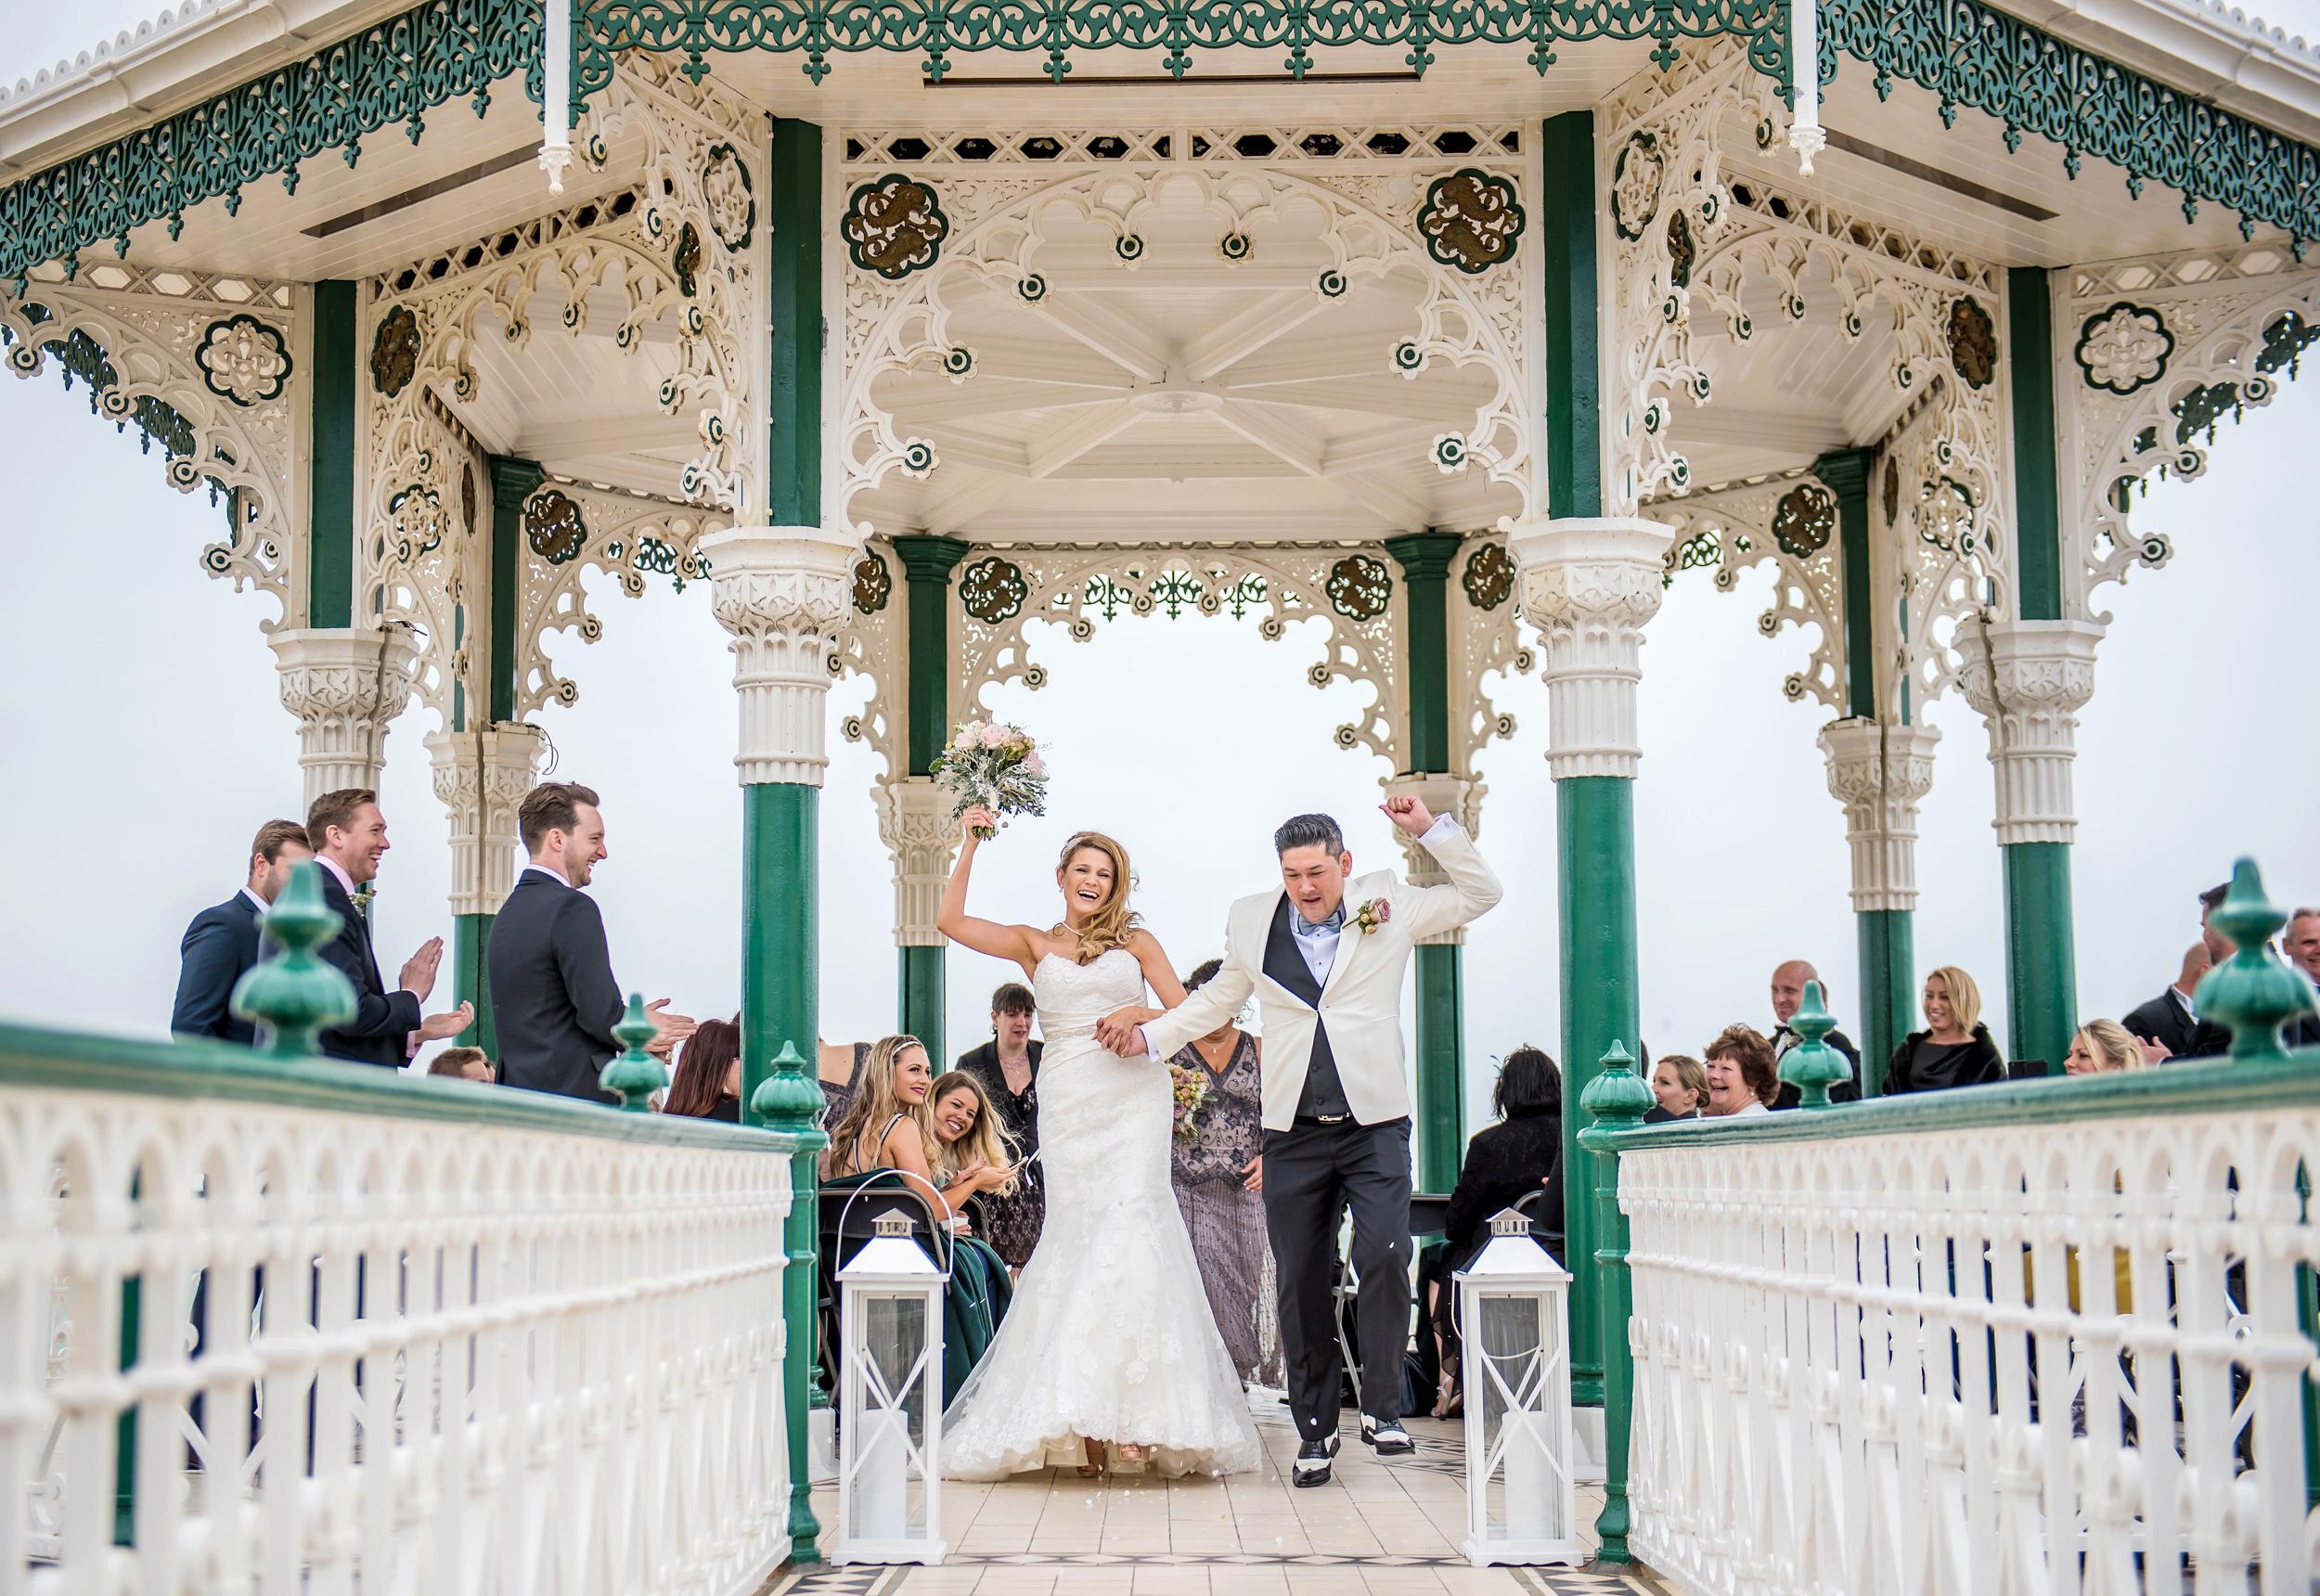 David Scholes Lancashire wedding photography 2016-5.jpg